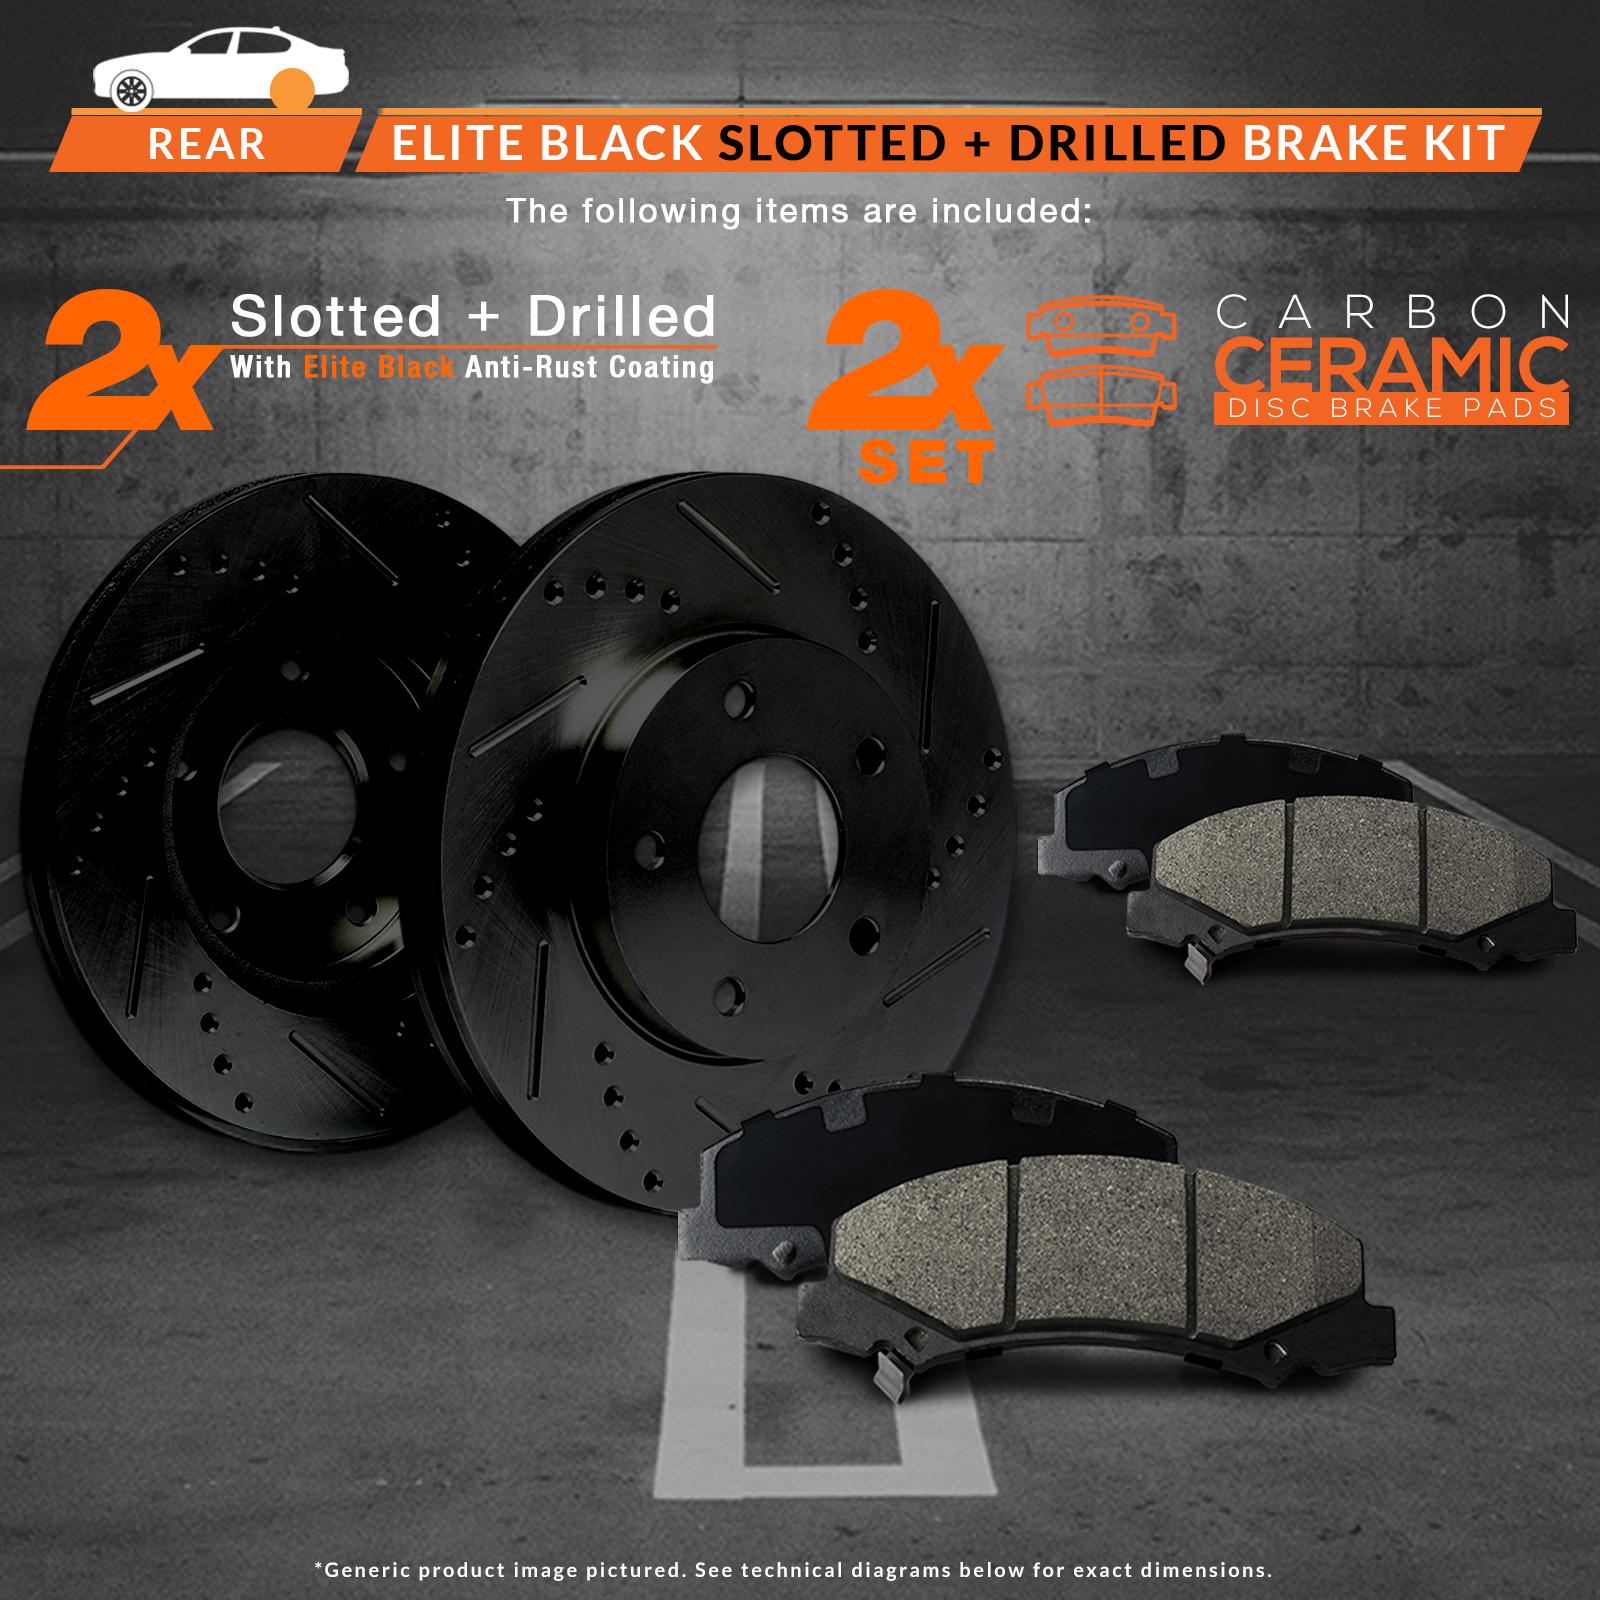 Max Brakes Rear Elite Brake Kit [ E-Coated Slotted Drilled Rotors + Ceramic Pads ] KT020282 | Fits: 2003 03 Audi A6 2WD; Non Quattro Models - image 5 de 8